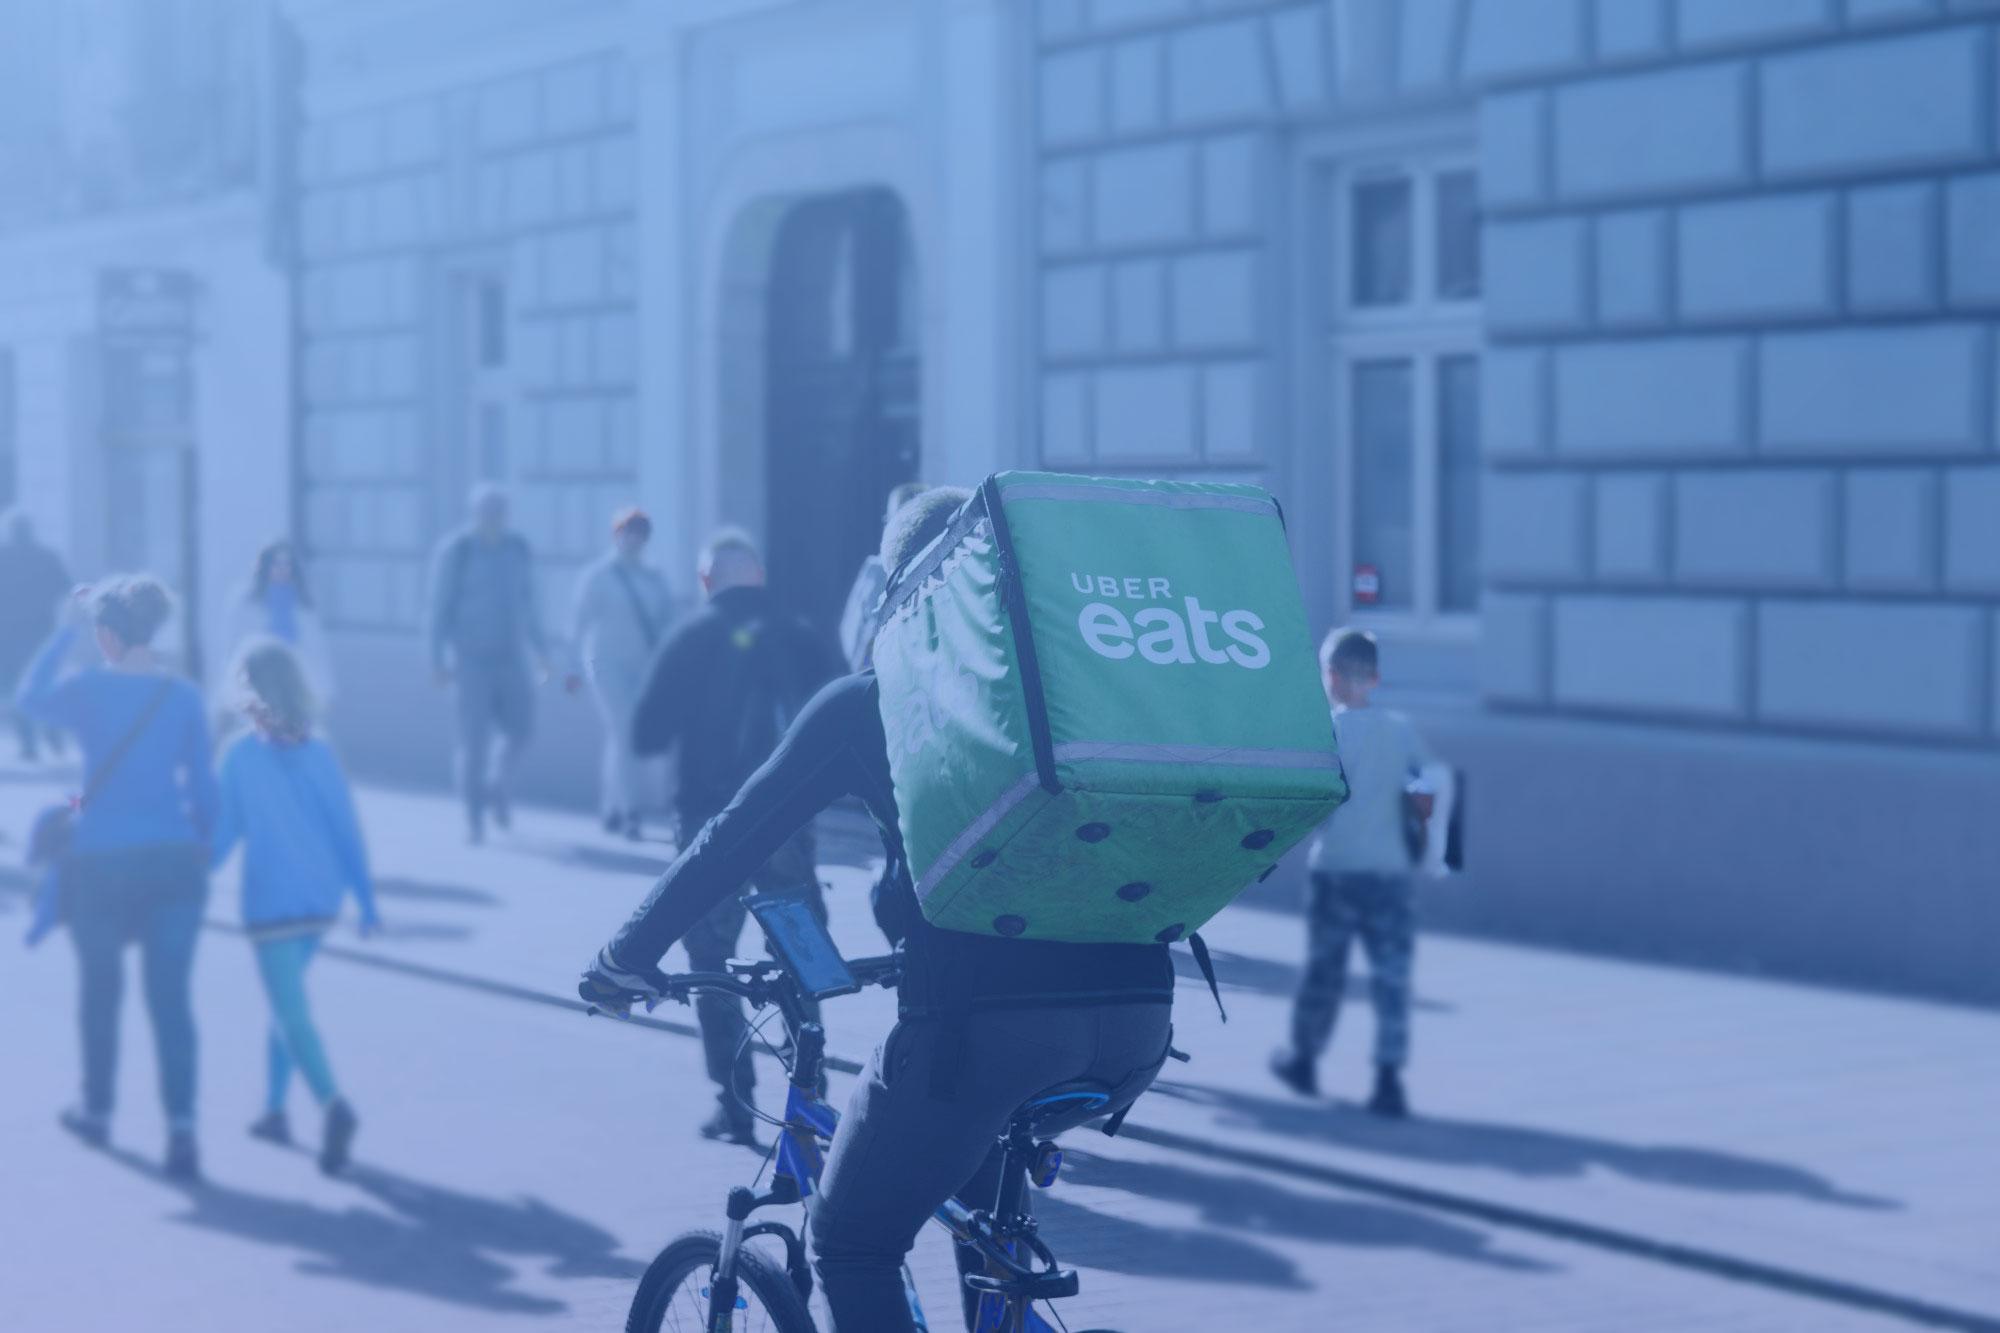 Uber-Eats-SuccessStory-1